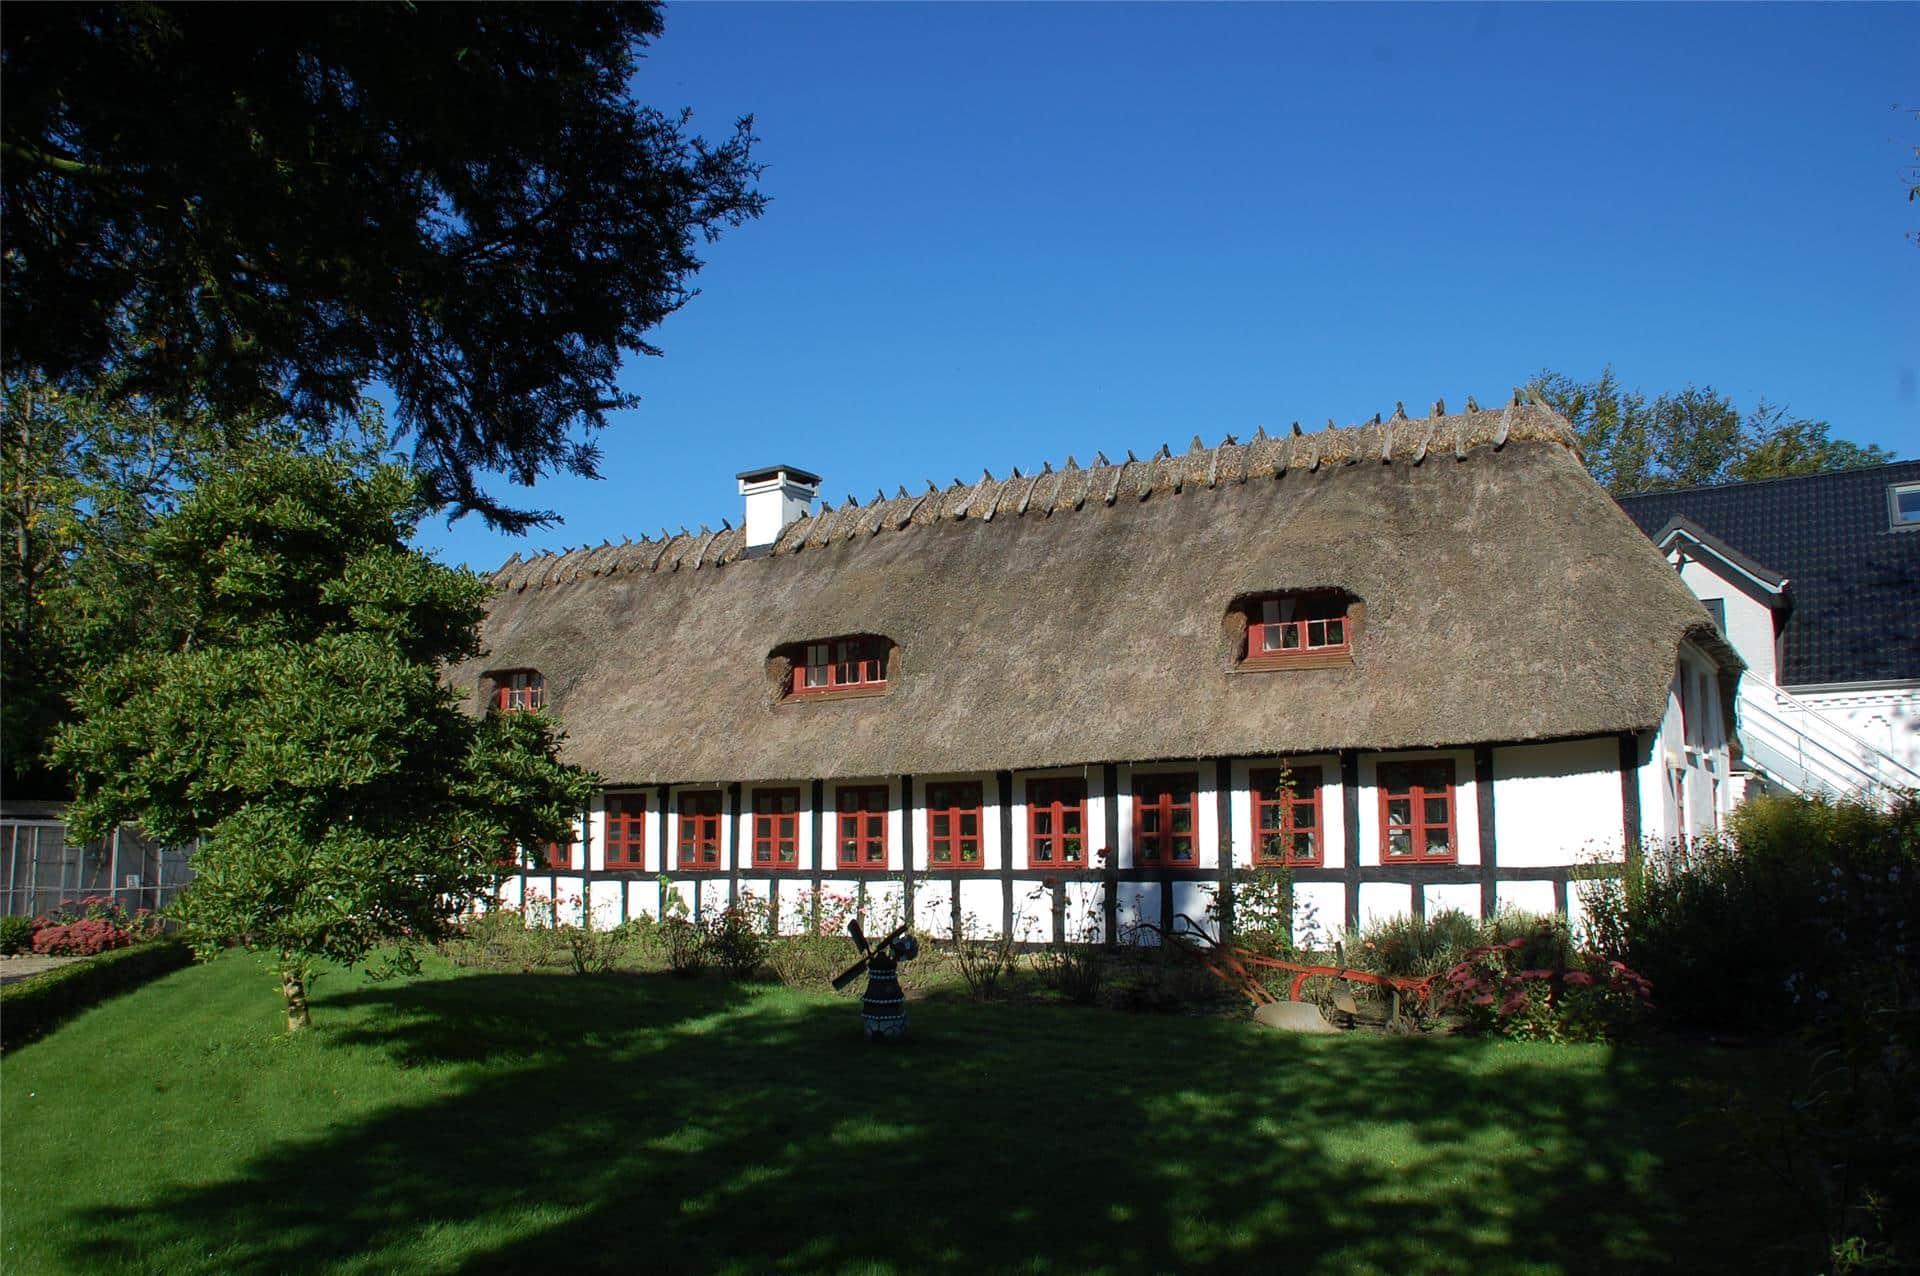 Billede 1-3 Sommerhus M65519, Skovvej 48, DK - 5690 Tommerup